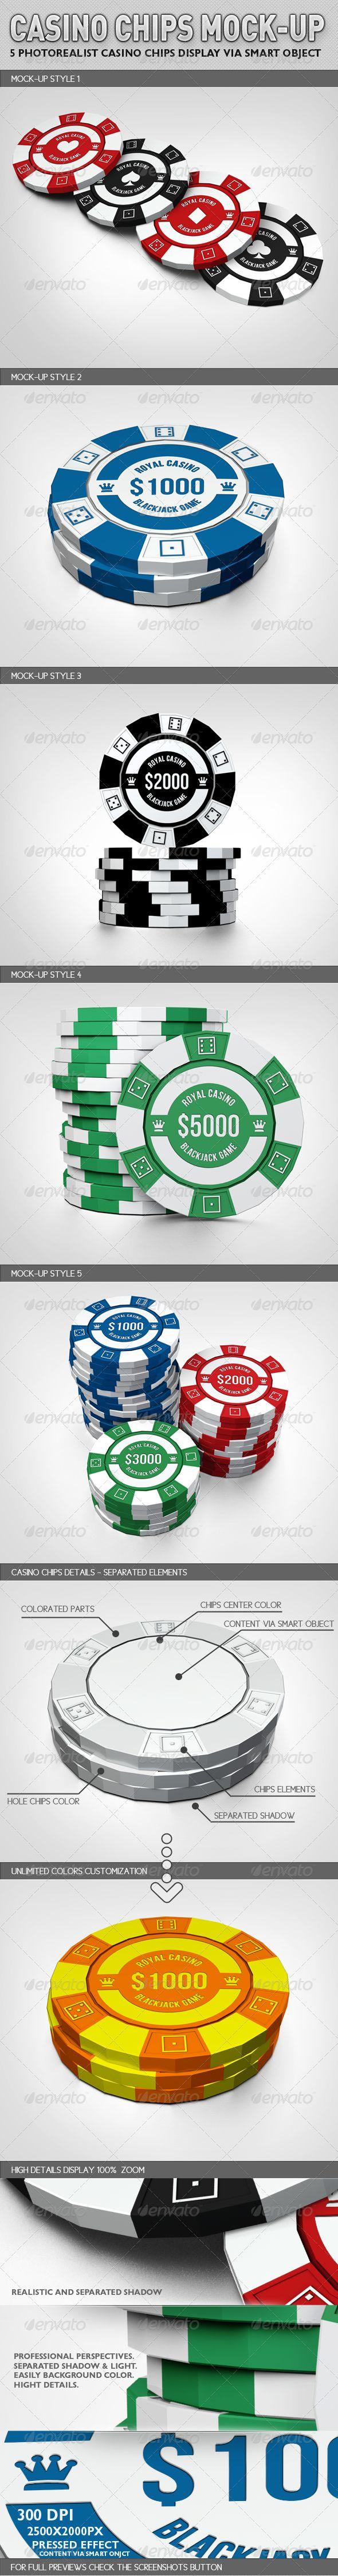 casino promo chips